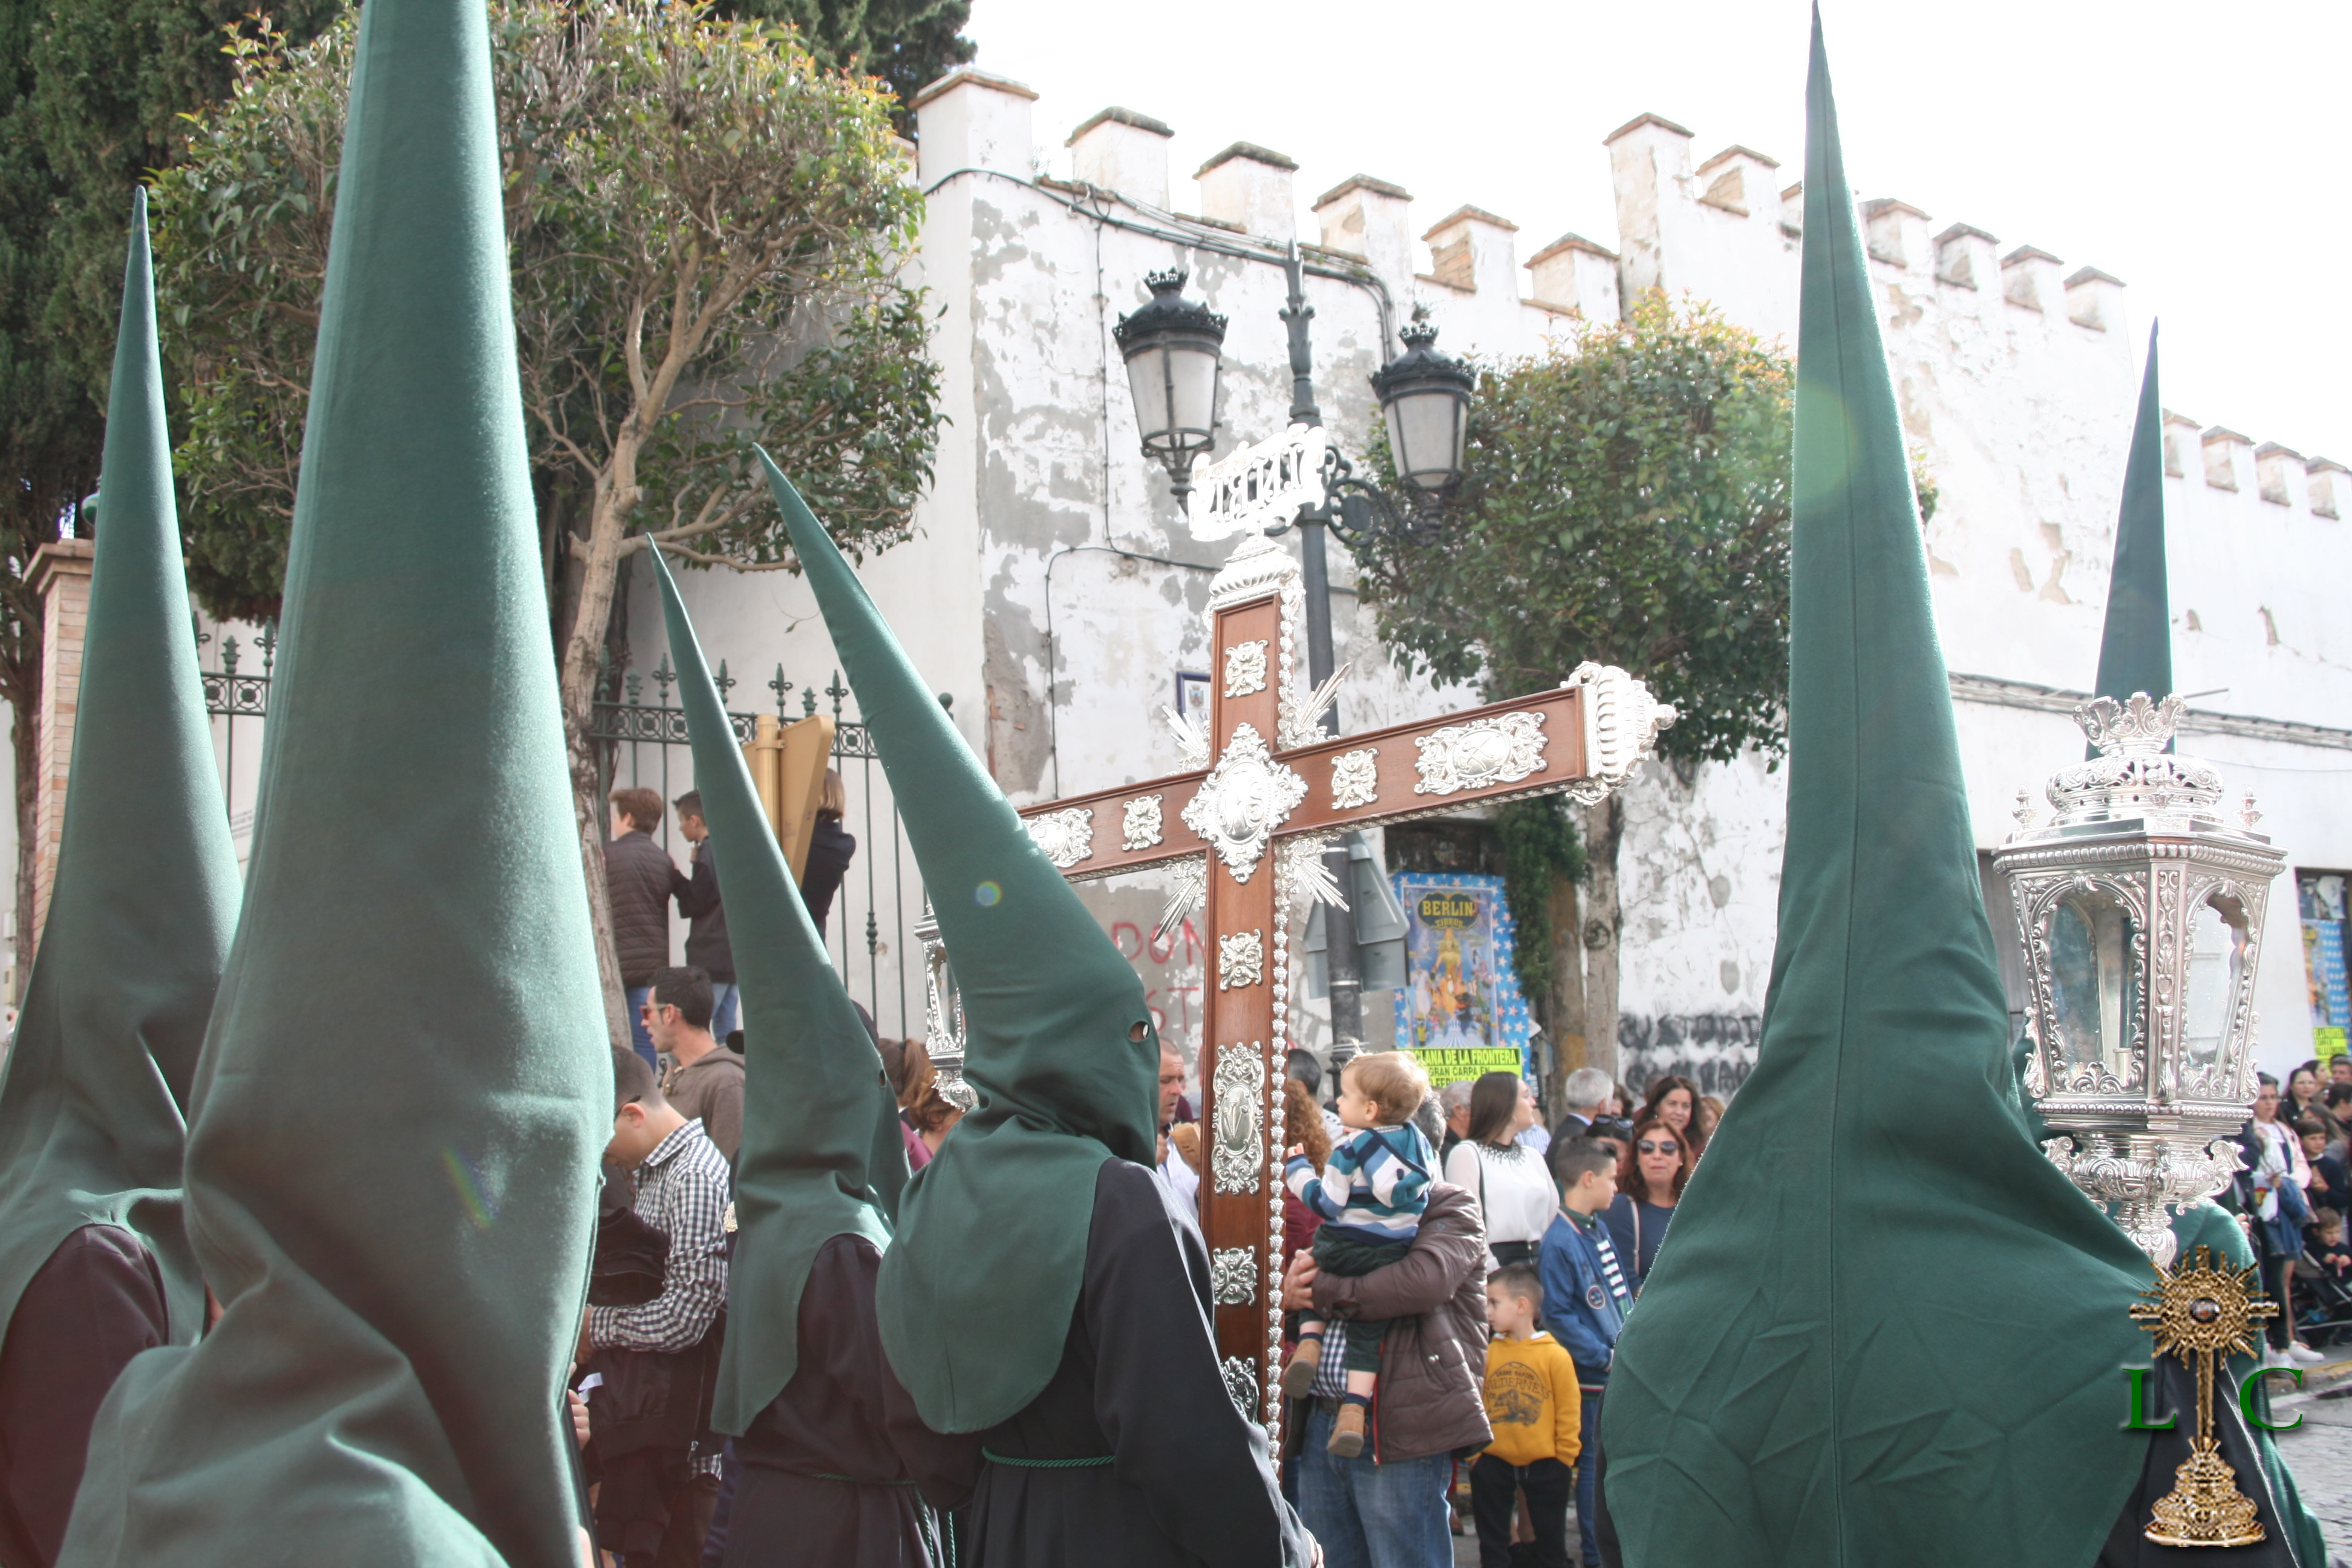 www.lignumcrucis.es-vera-cruz-chiclana-estacion-2019-6